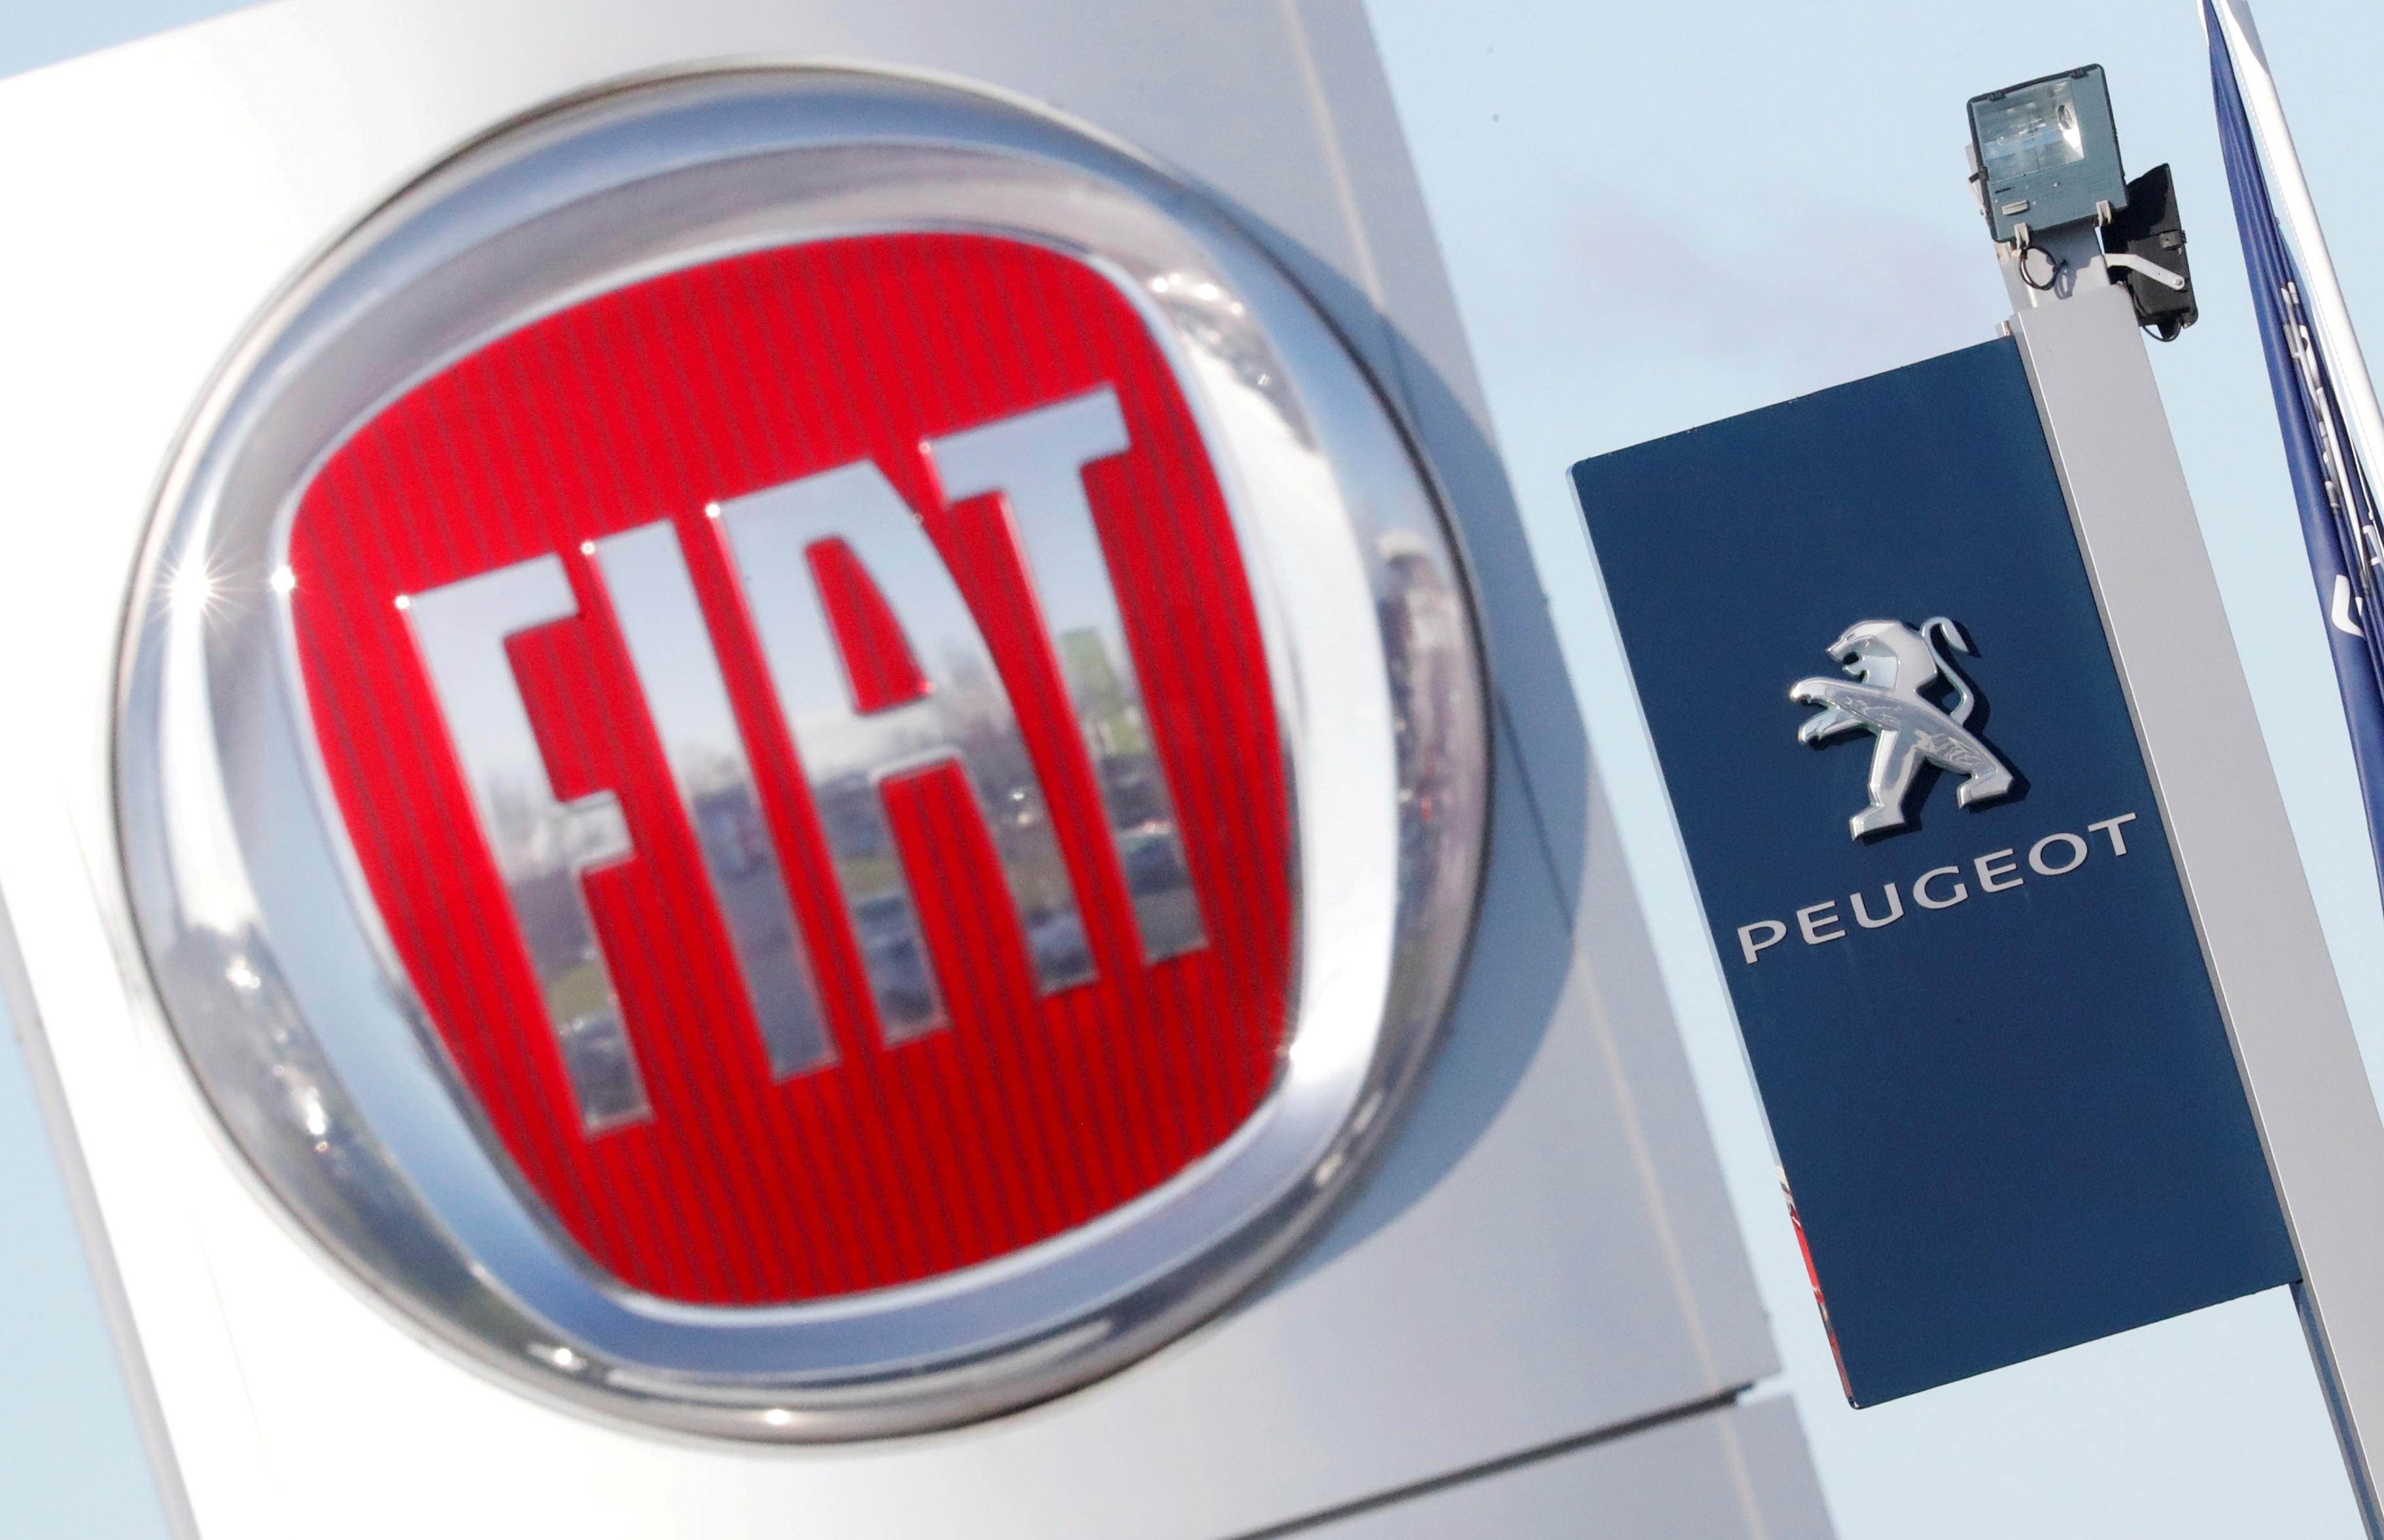 Fiat Chrysler and Peugeot sign deal for 50-50 merger